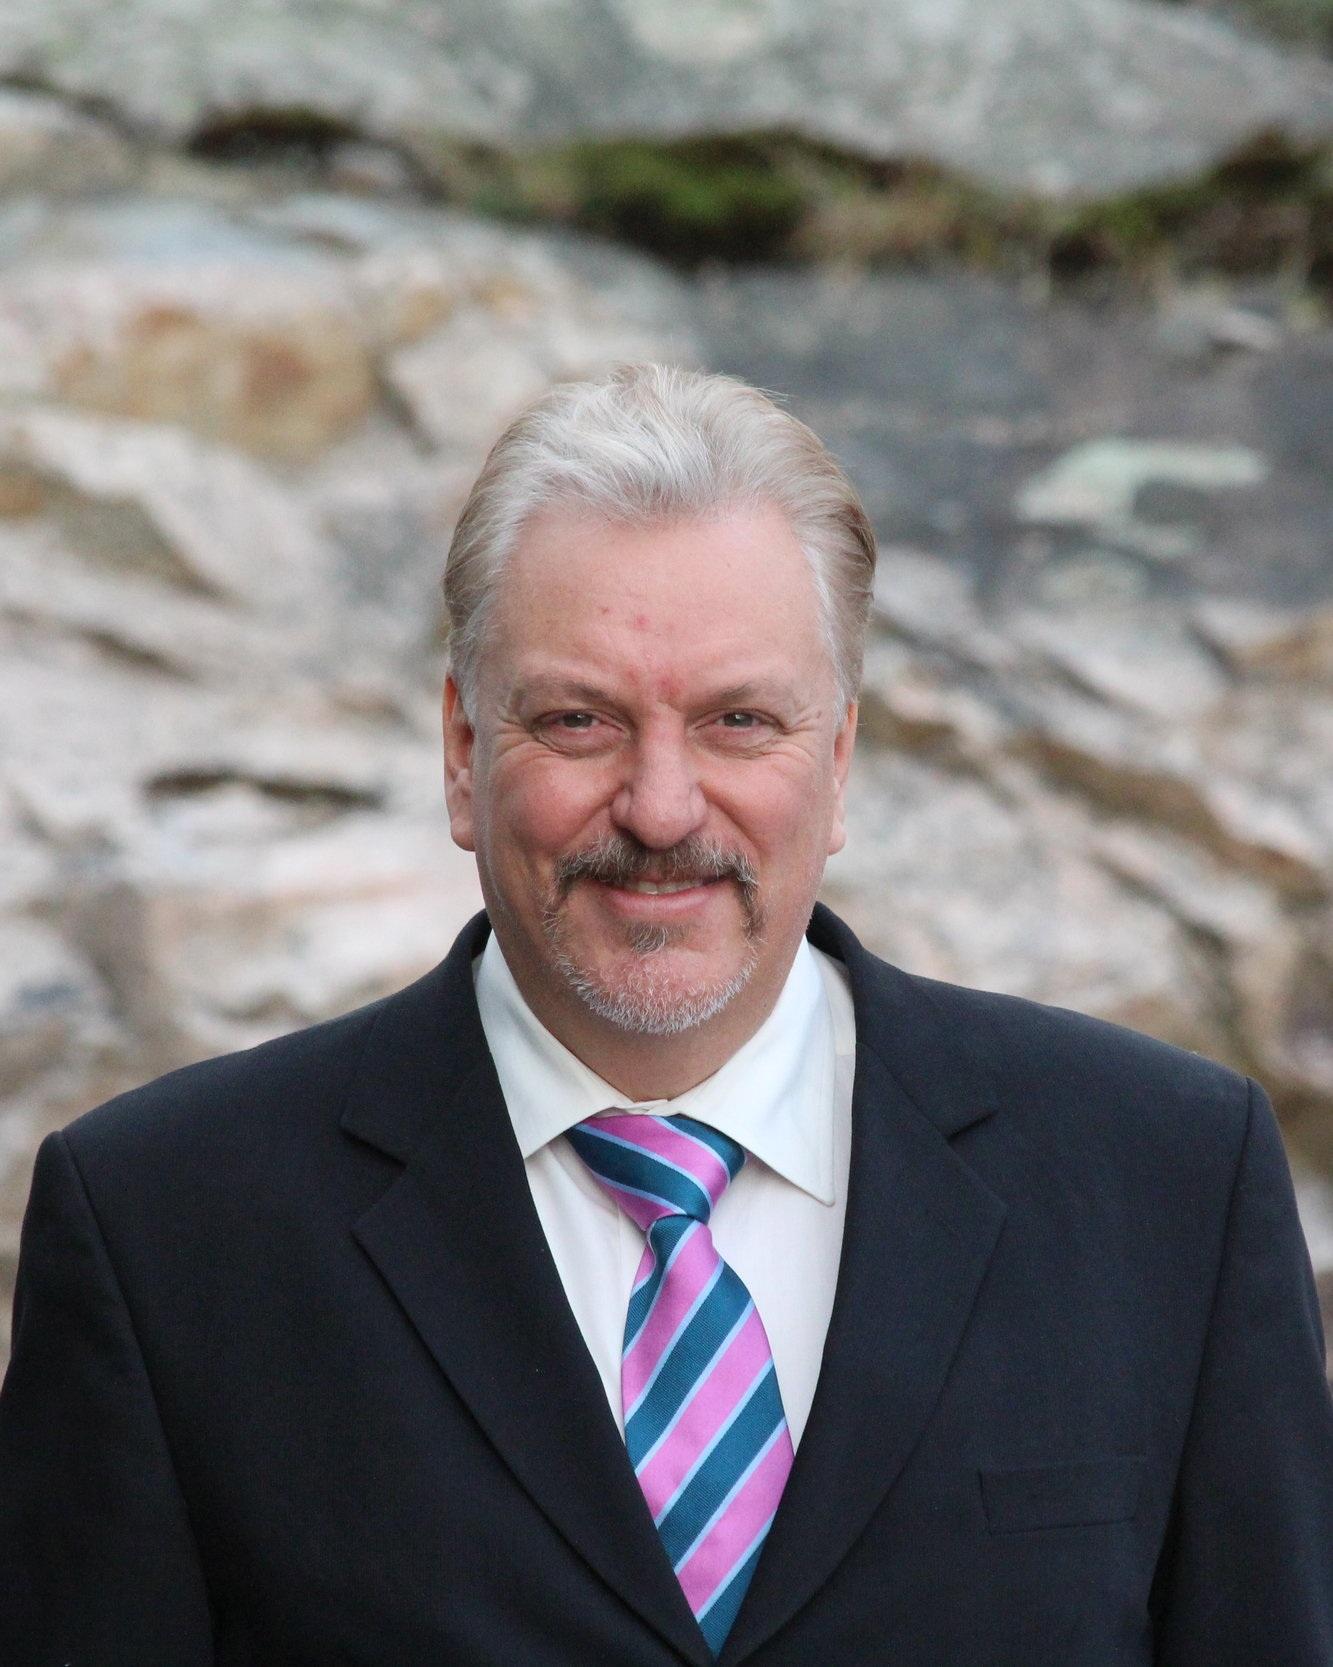 Jörgen Rygaard Business Unit Manager, Sweden ➤ Gothenburg ☎ +46 70-422 29 96 ✉ jorgen@advantek.se